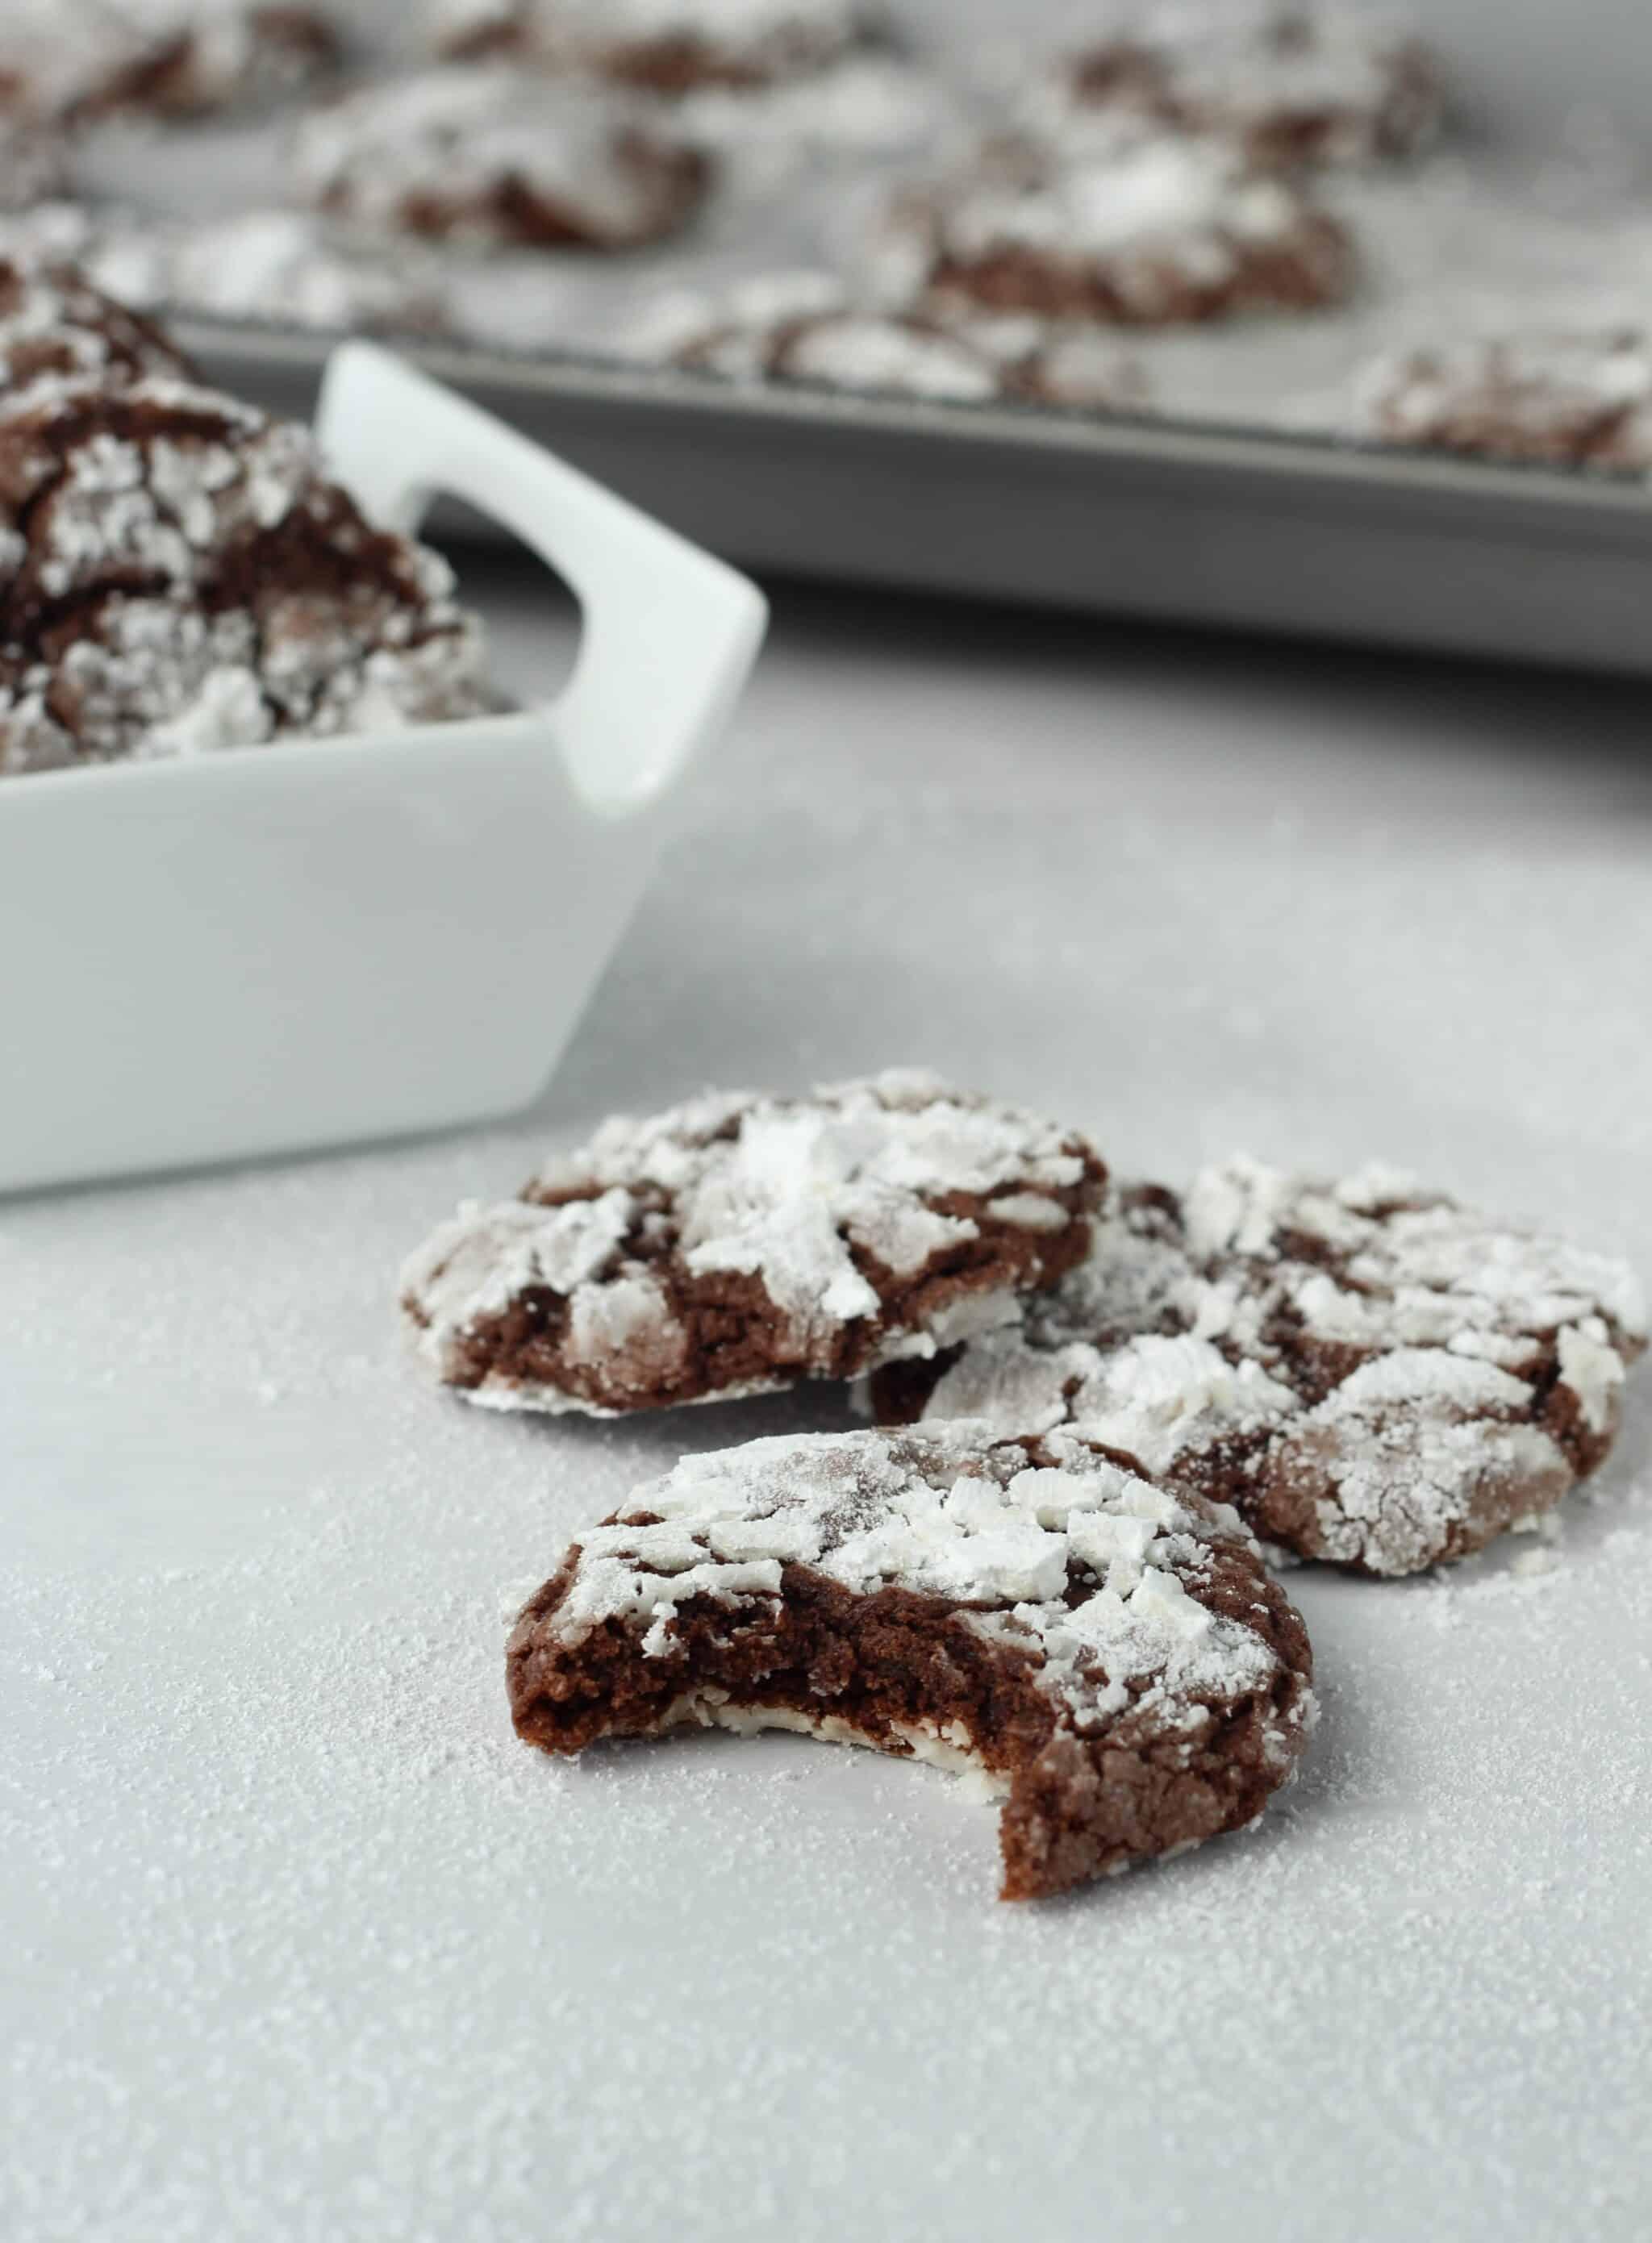 Chocolate Crackle Cookies - American Heritage Cooking